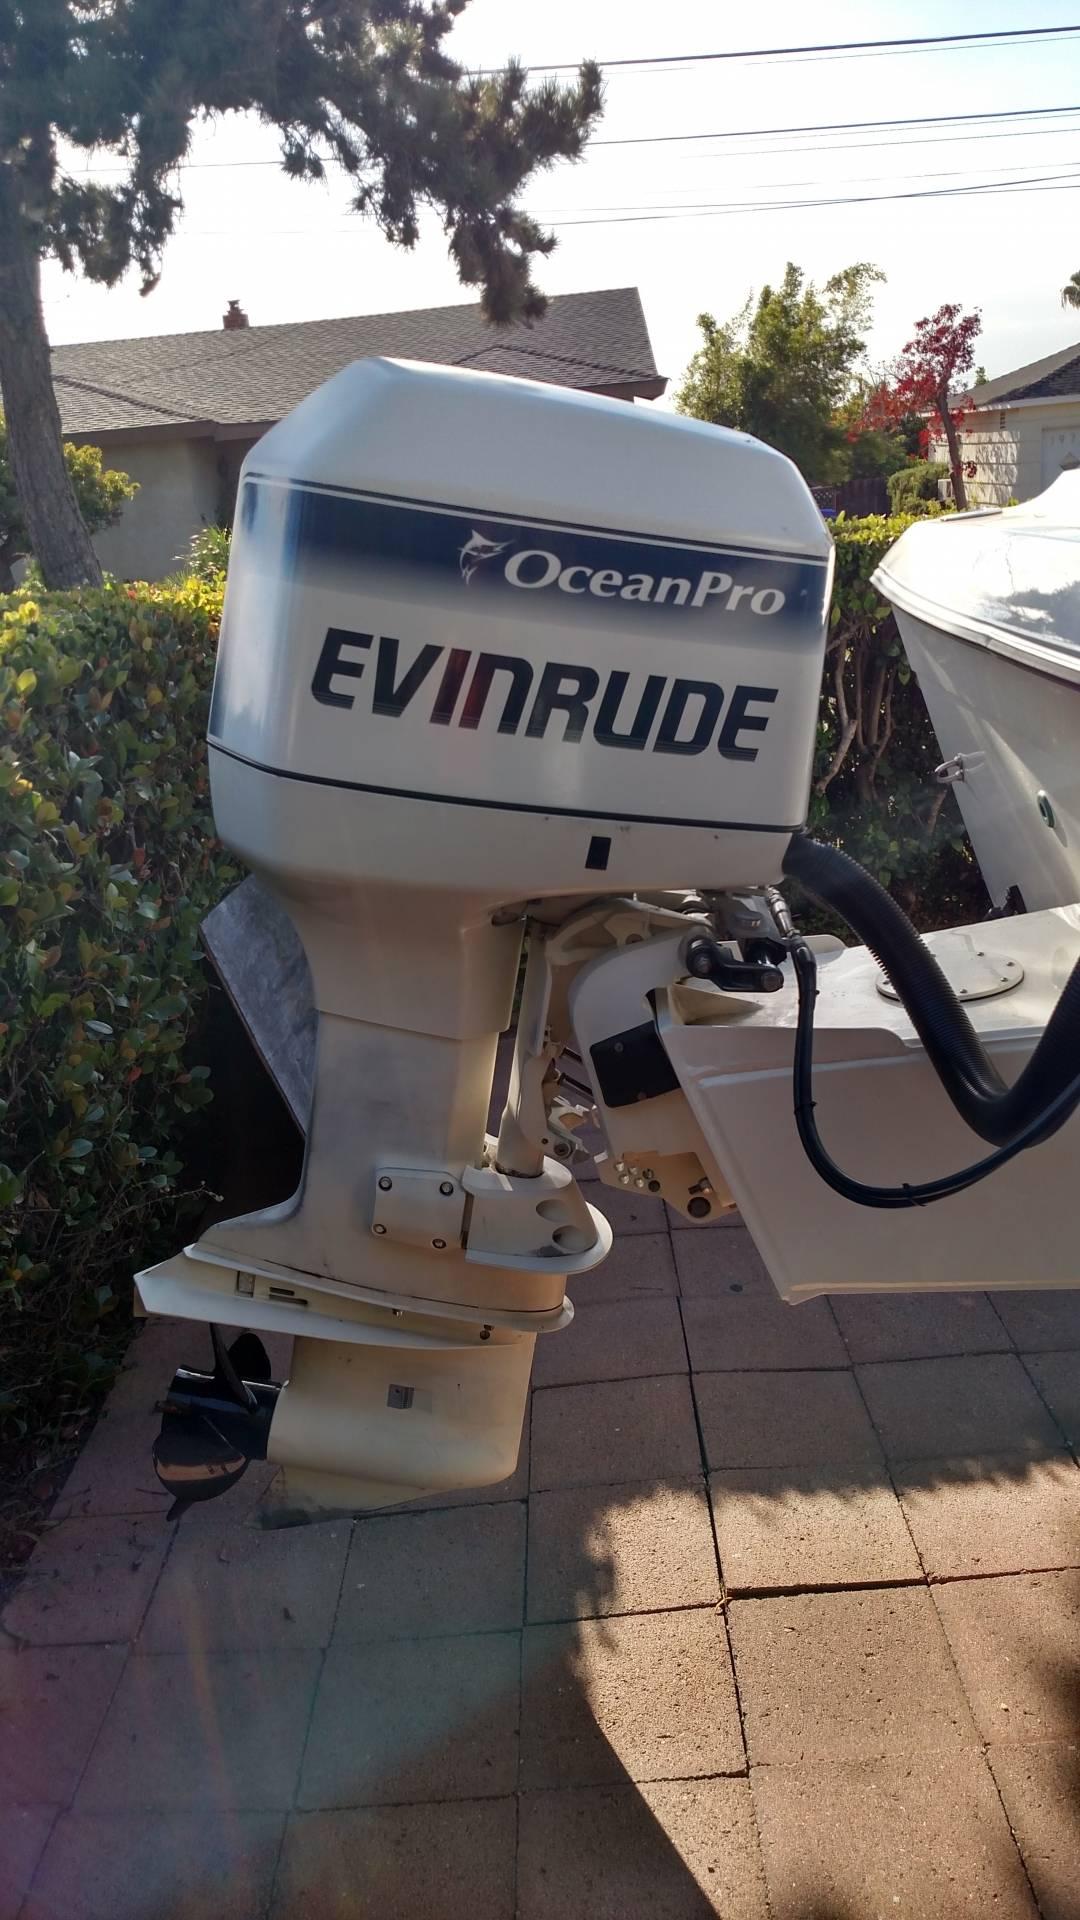 Evinrude Ocean Pro 200 035.jpg